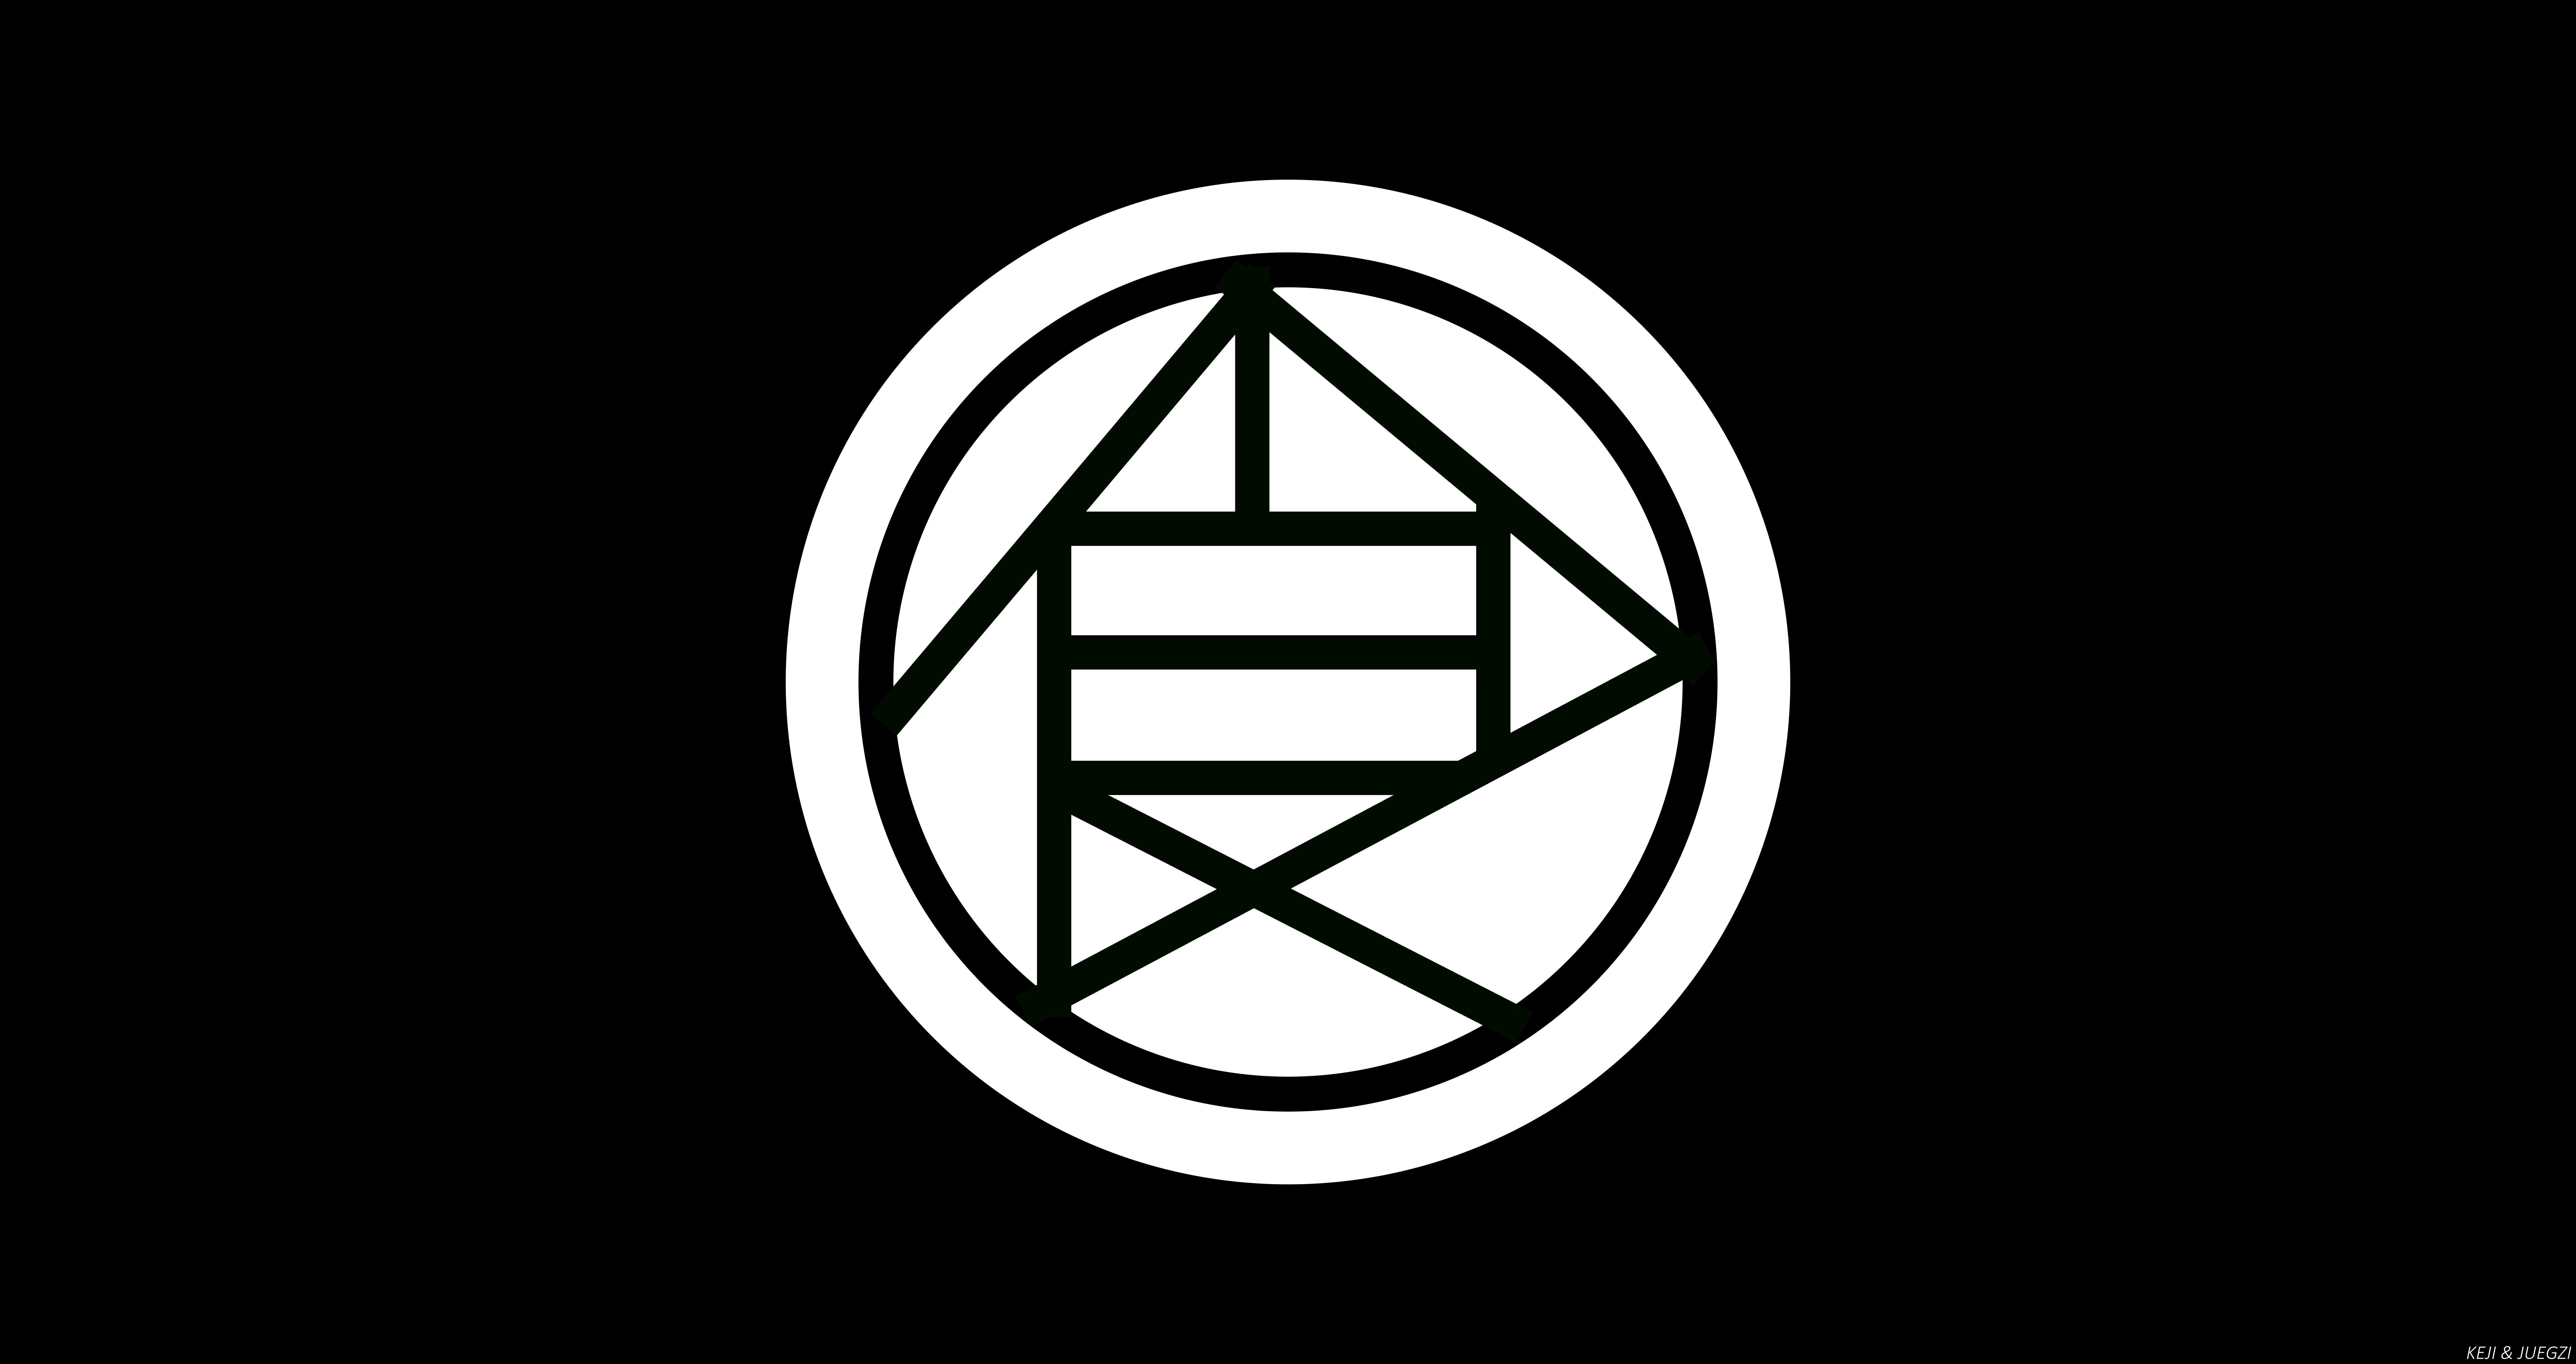 Boruto Anime Boruto Naruto Next Generations Circle Naruto Shapes Symbol 8500x4500